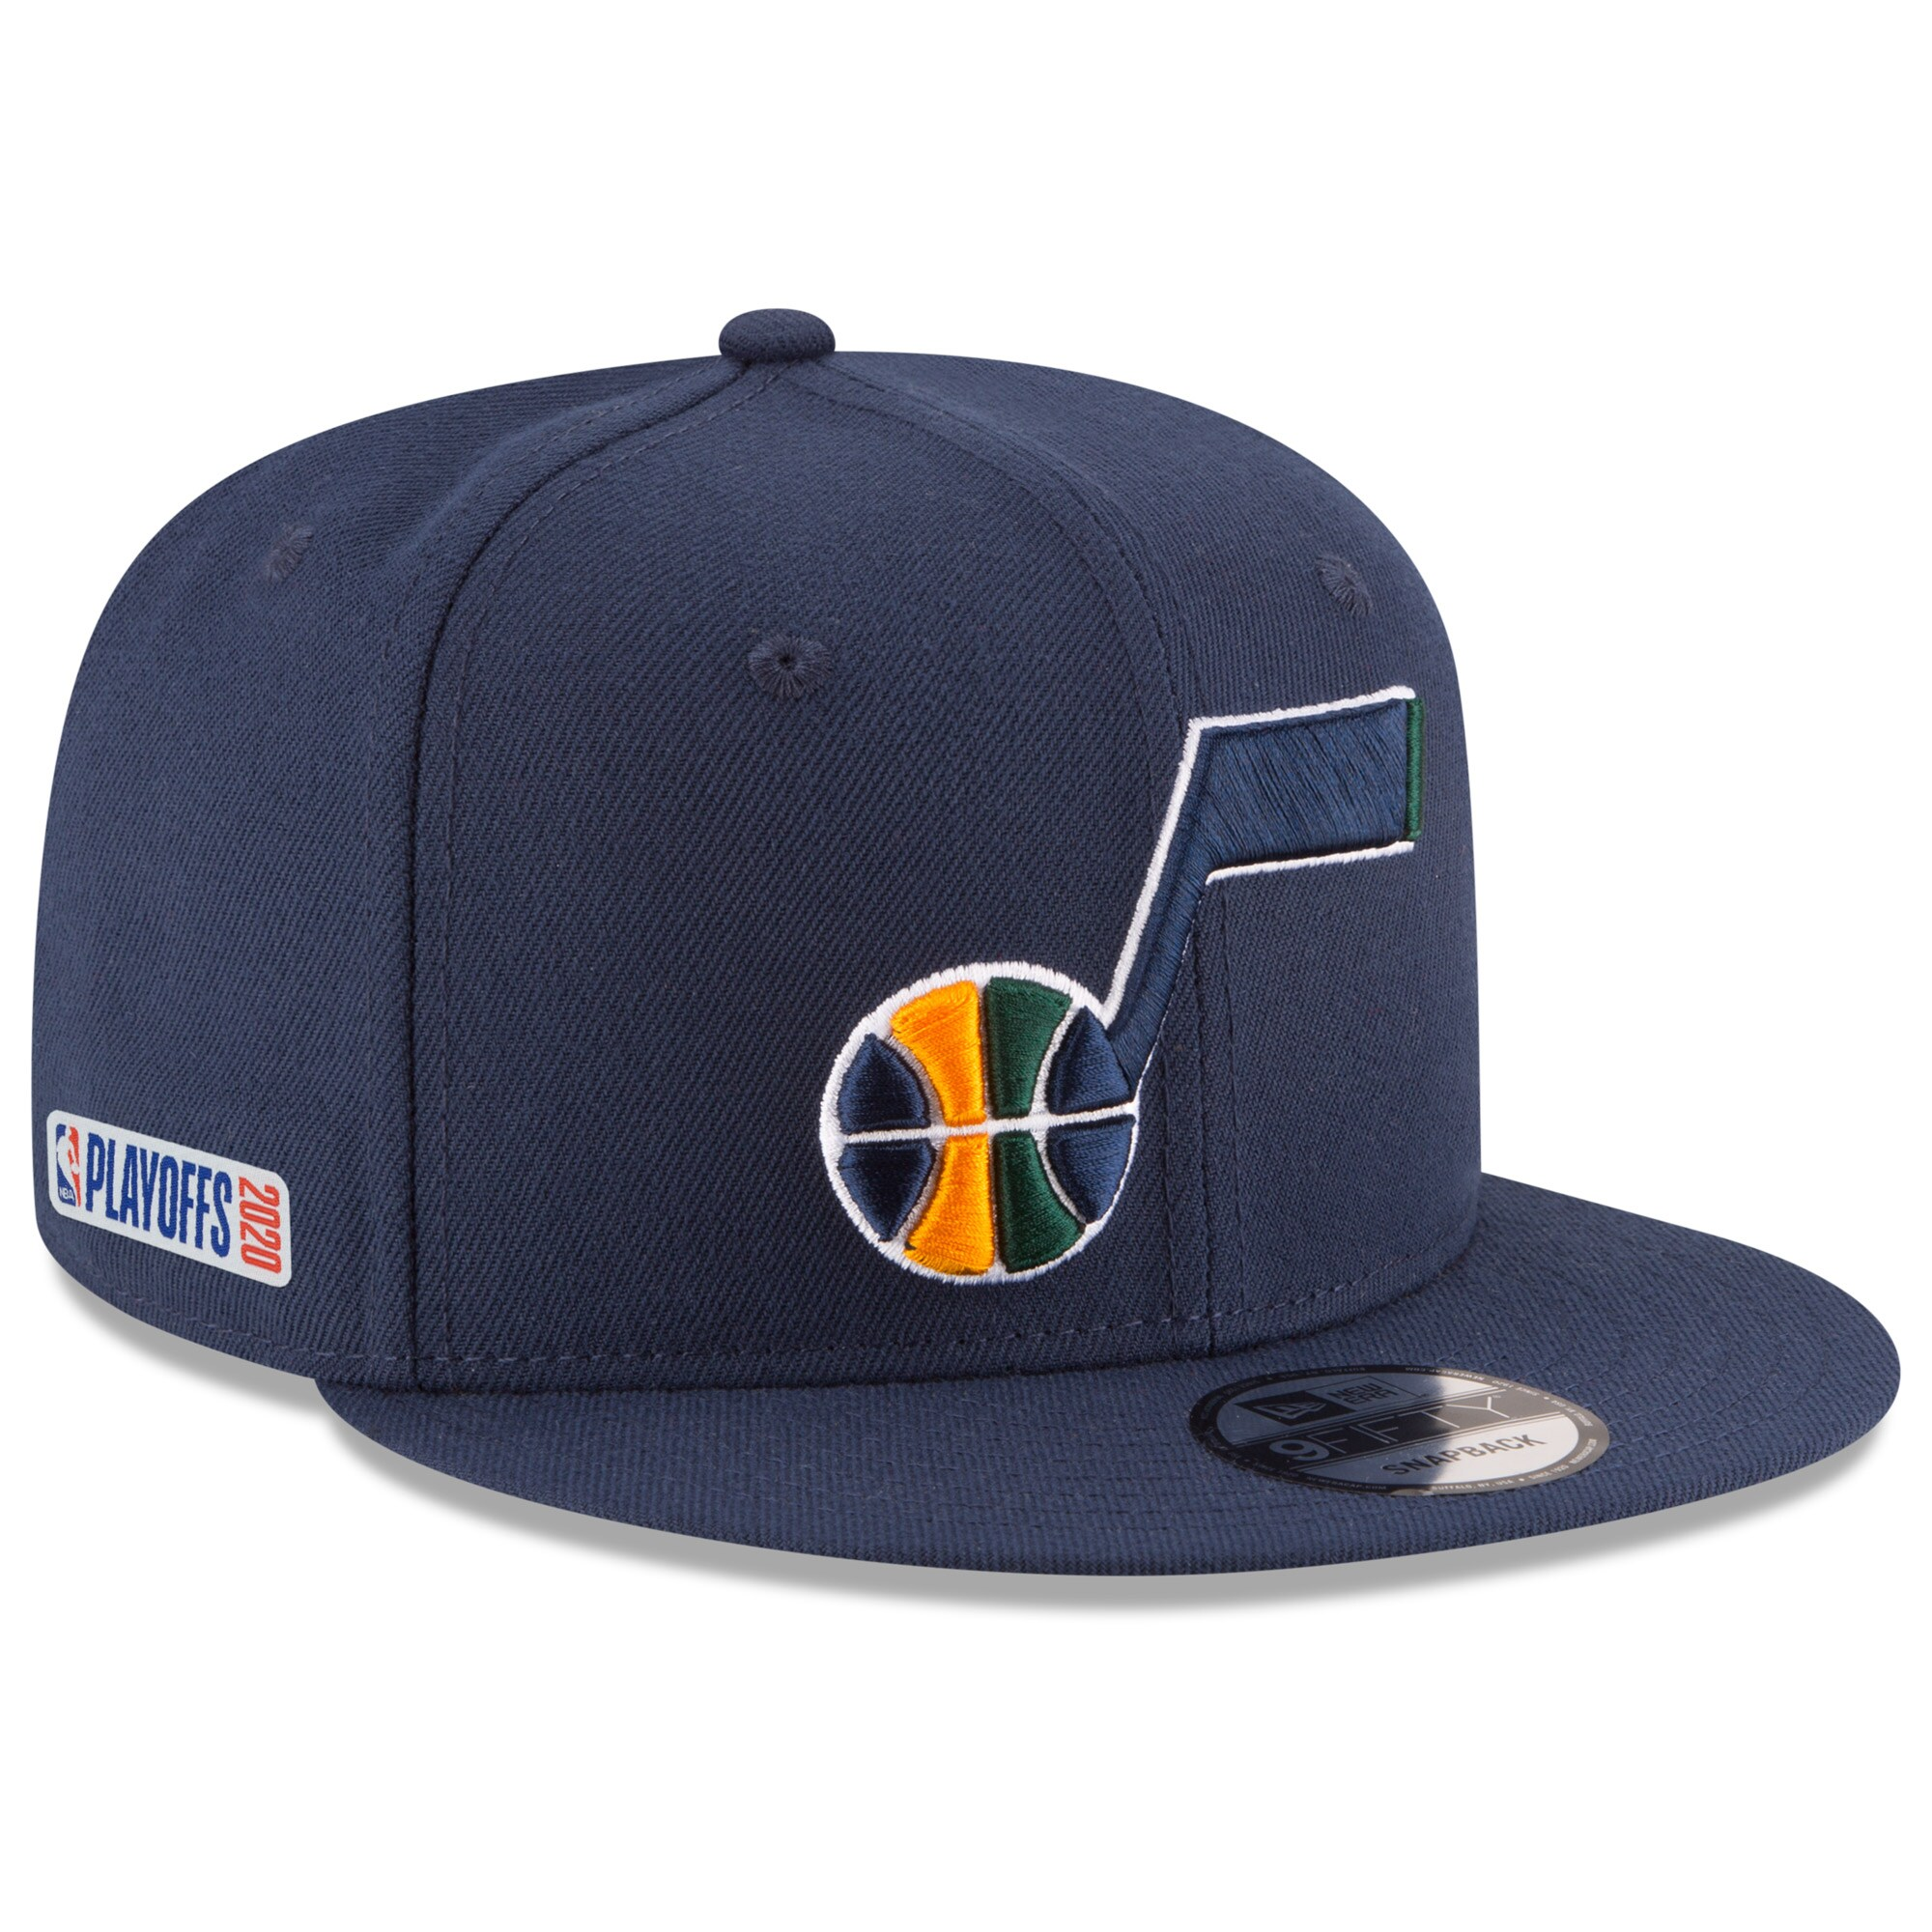 Utah Jazz New Era 2020 NBA Playoffs Bound 9FIFTY Snapback Adjustable Hat - Navy